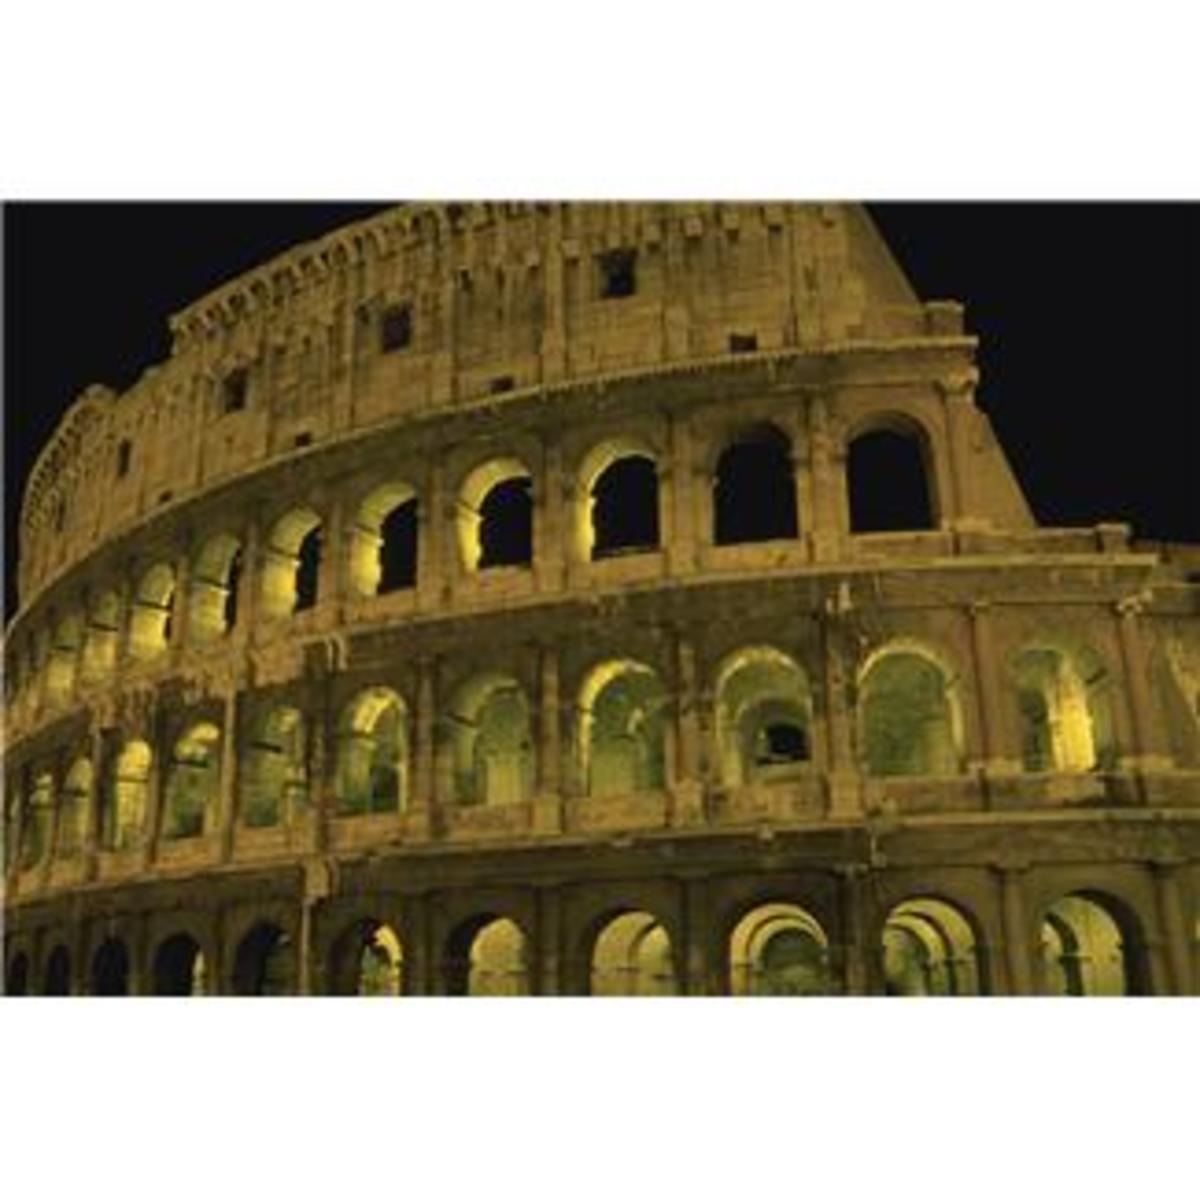 The Roman Coliseum after dark.